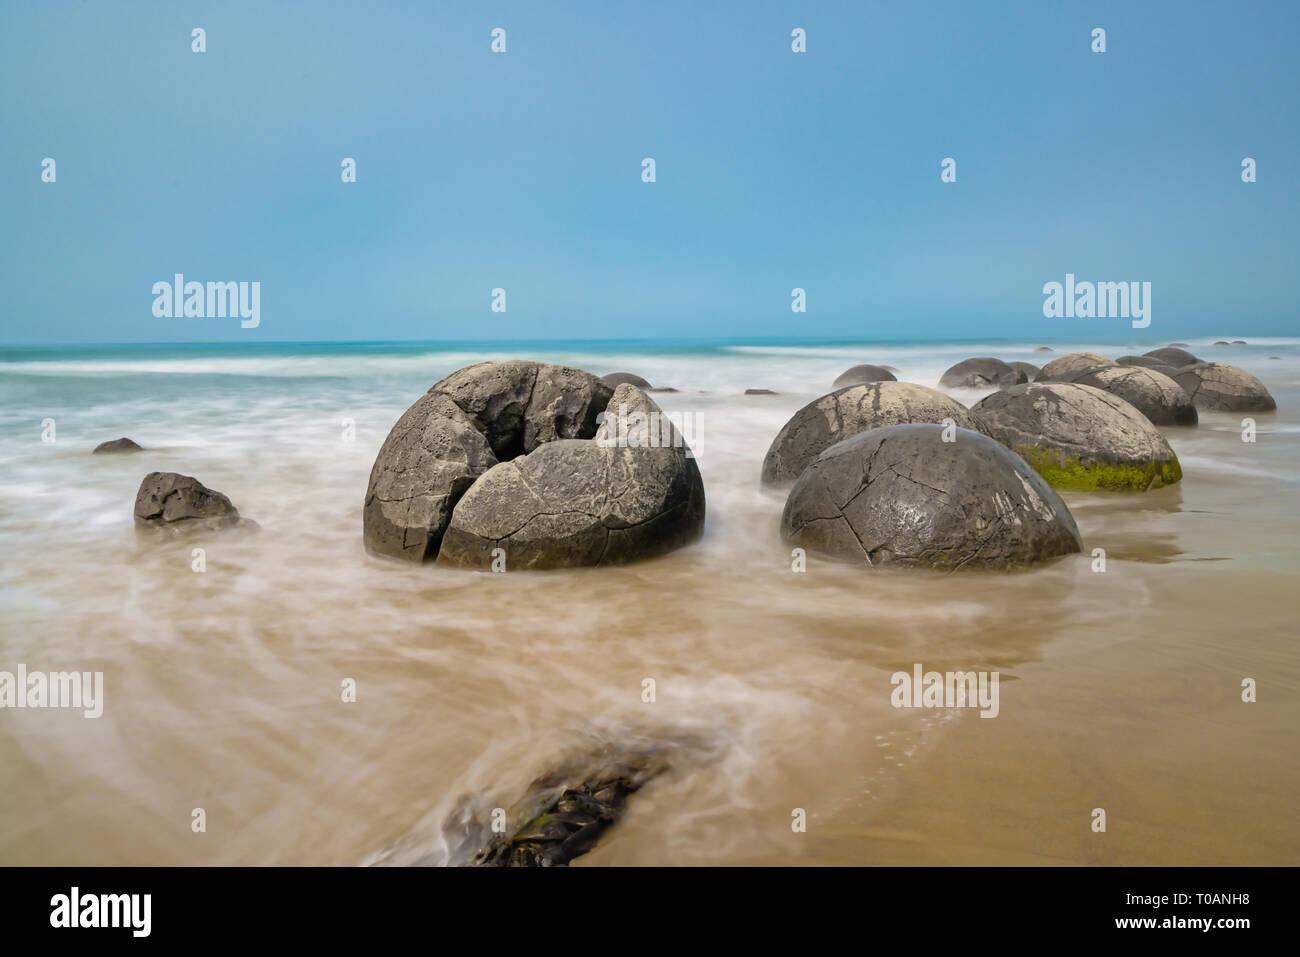 Moeraki Boulders on Koekohe Beach natural wonder and tourist attraction on coastal South Island New Zealand - Stock Image